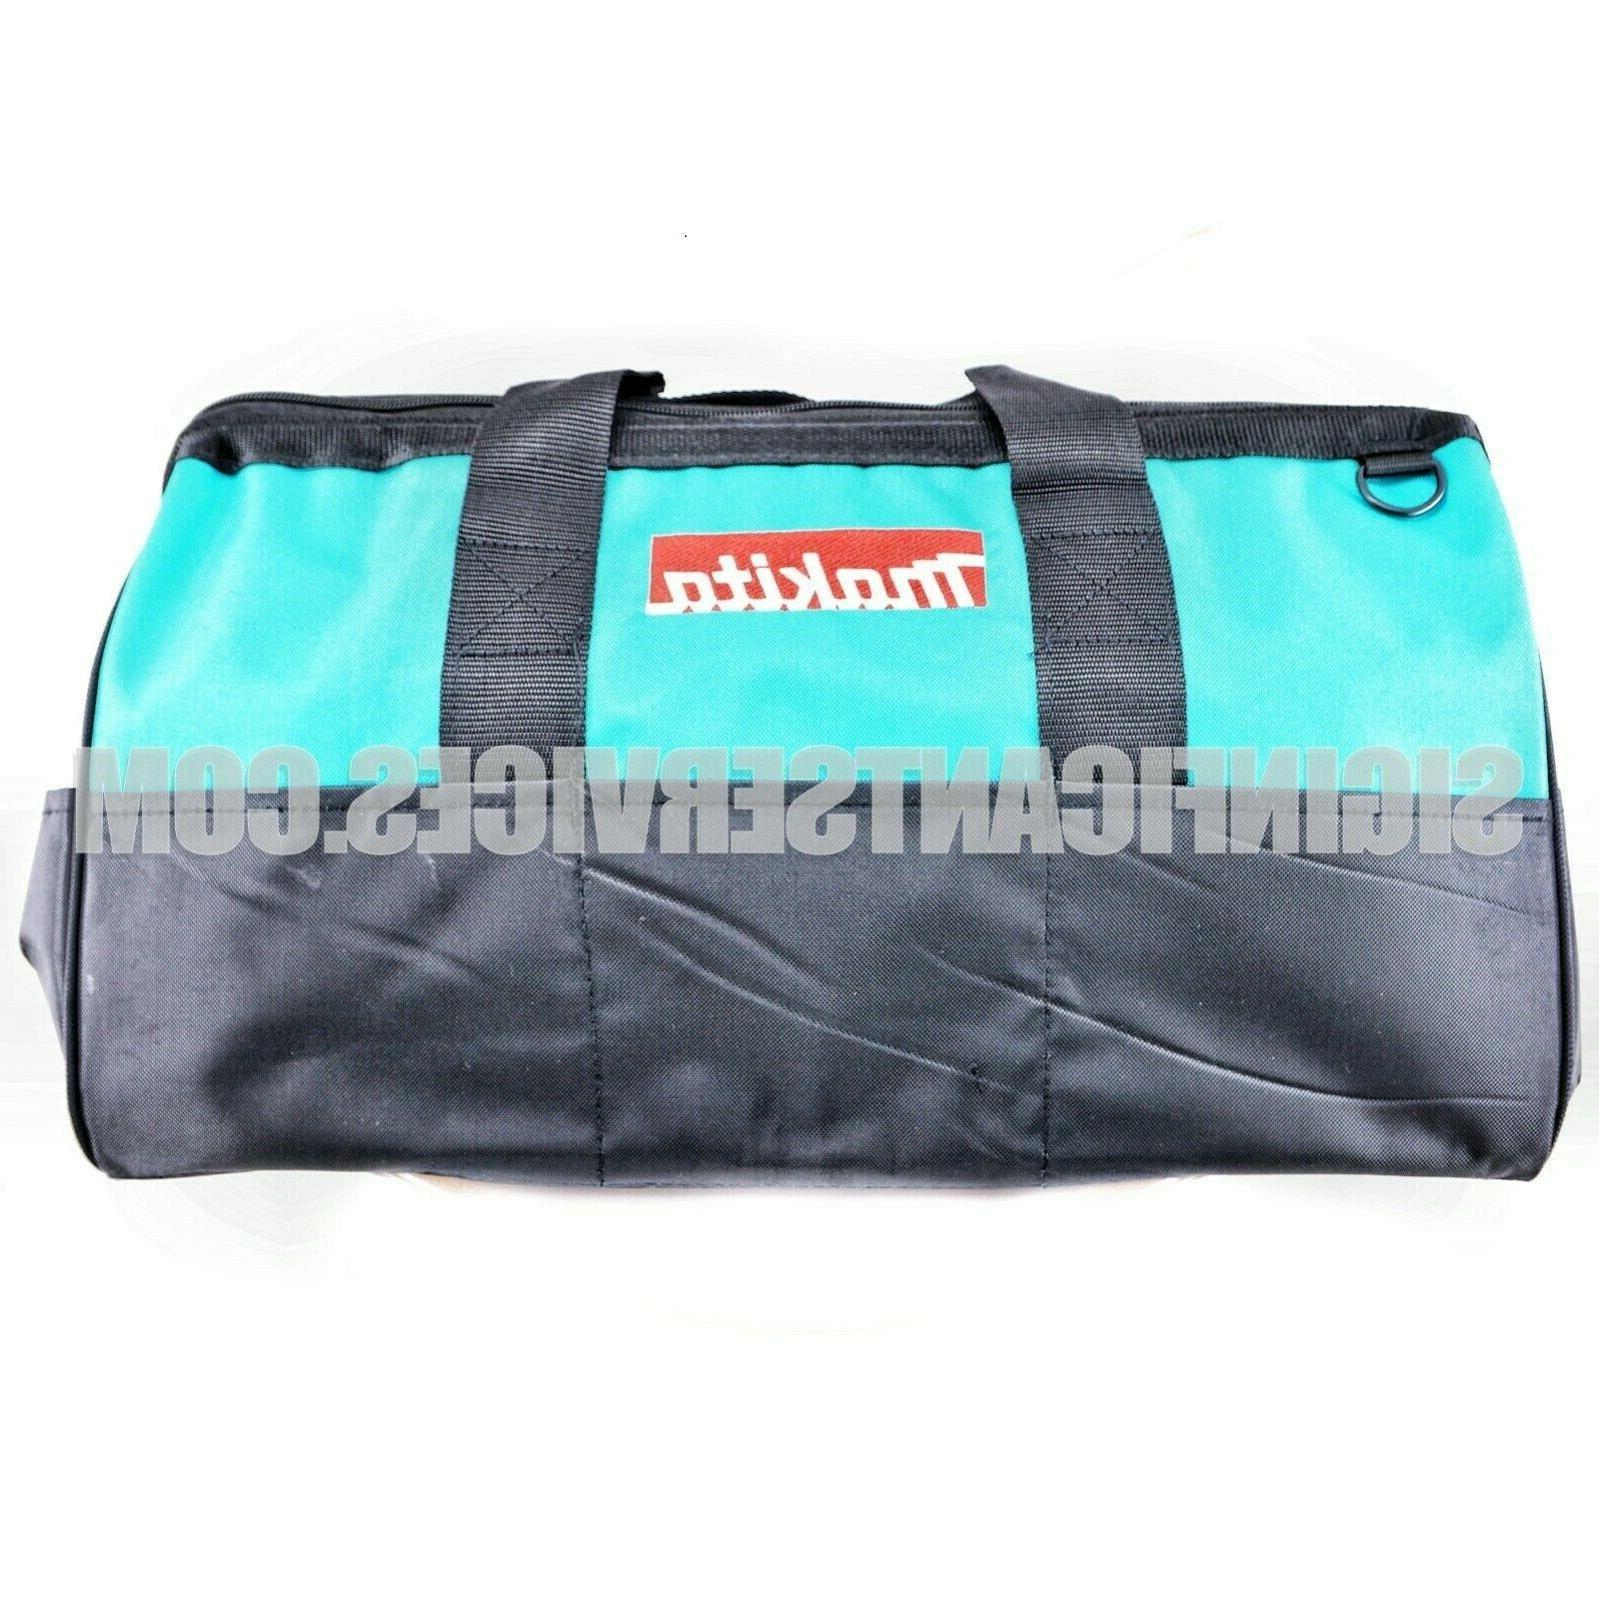 New Makita Saw Bag Case